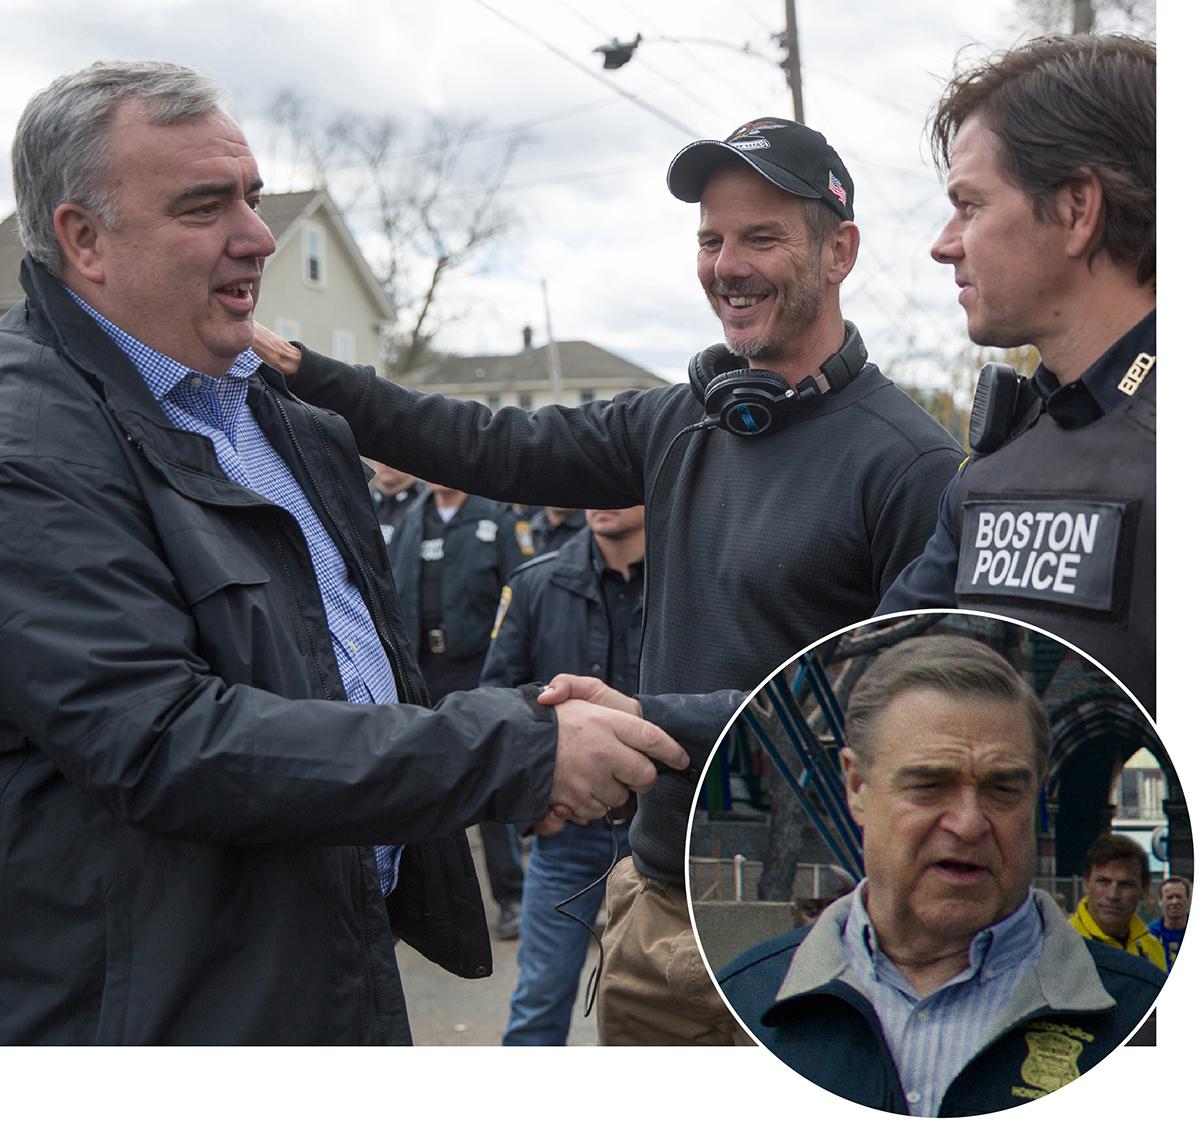 patriots day movie ed davis boston police commissioner john goodman